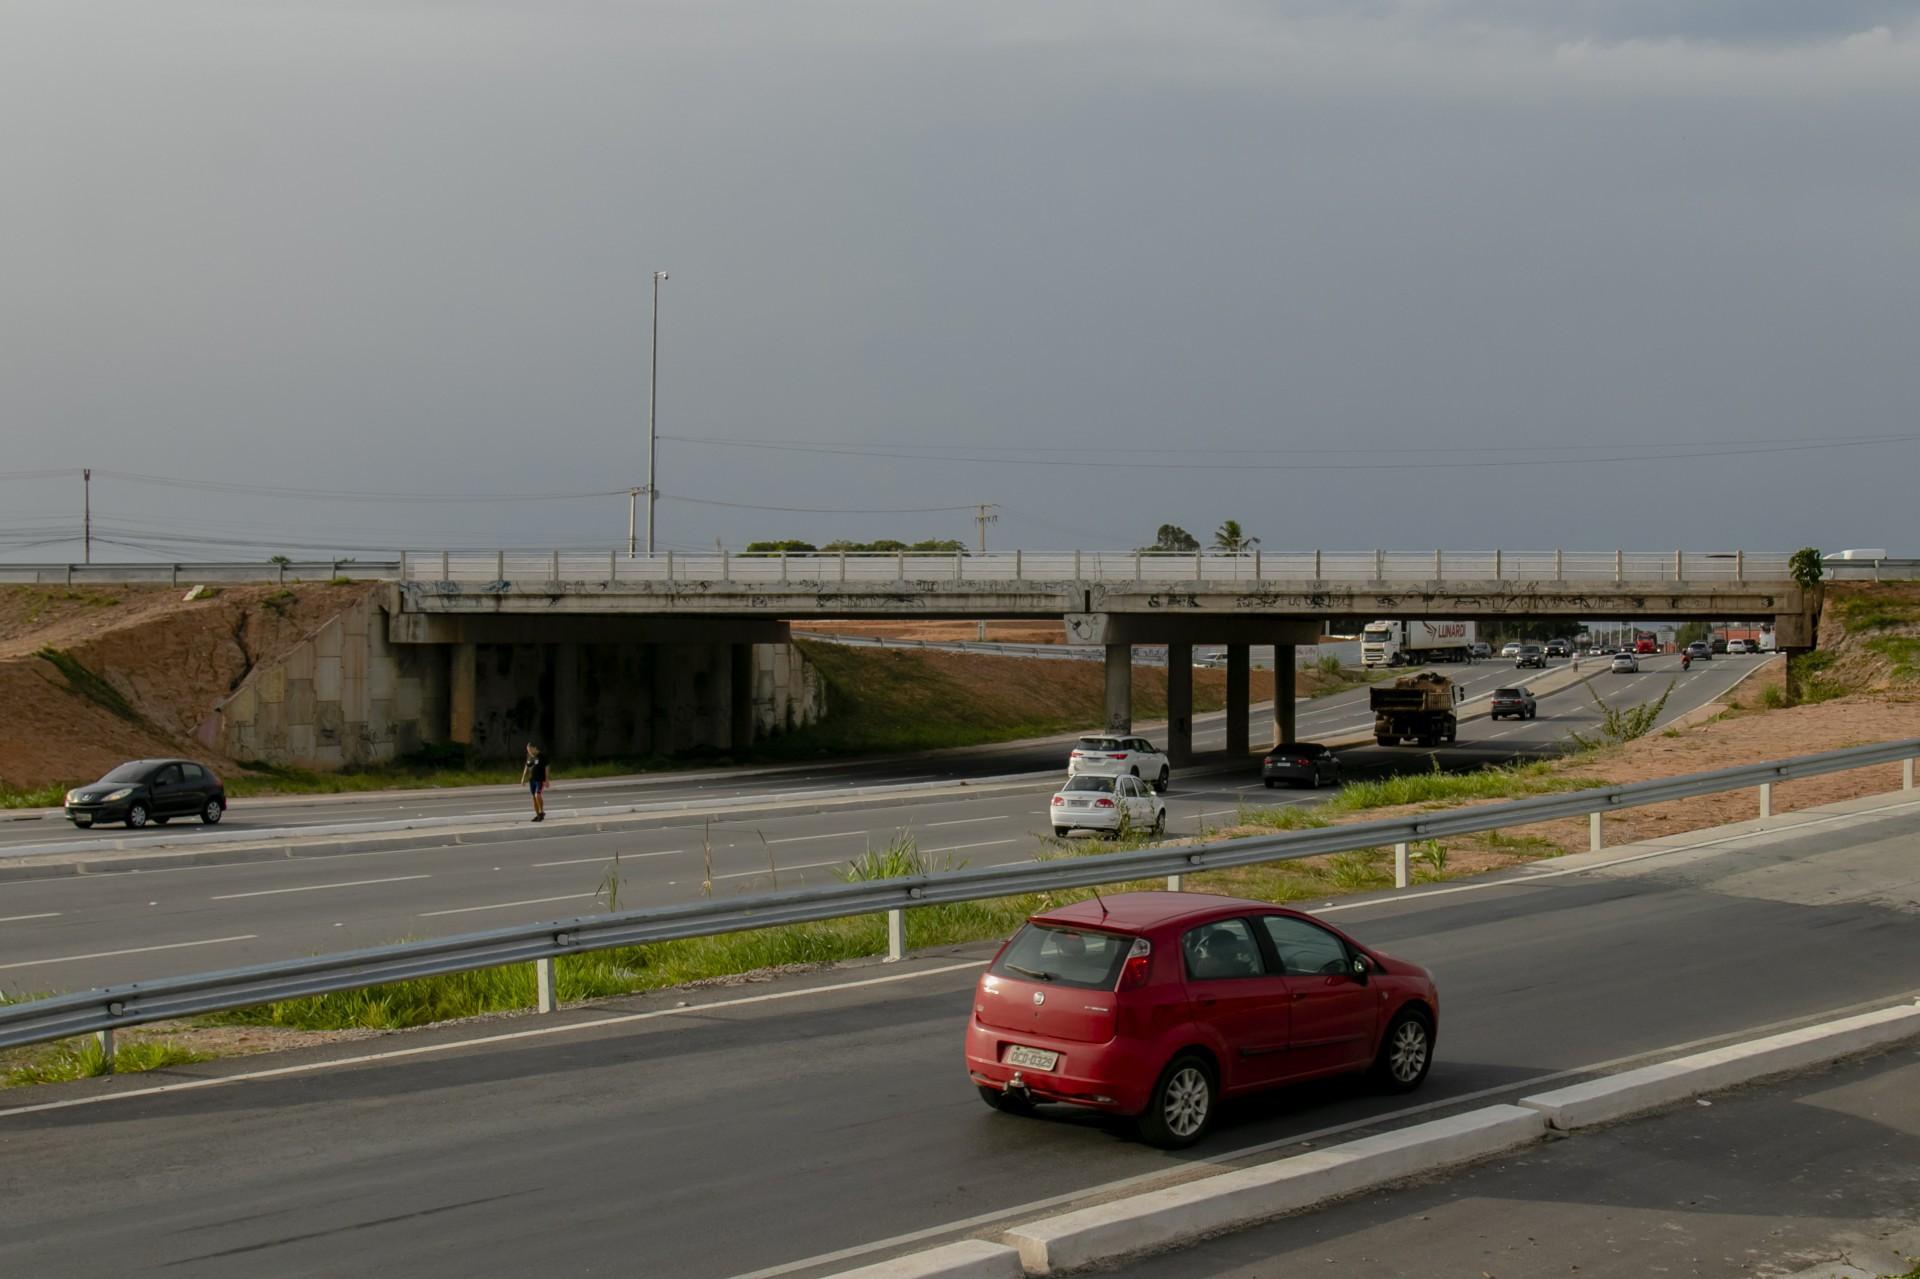 UM DOS trechos concluídos pelo Dnit foi o viaduto que conecta a BR-020 e a CE-010